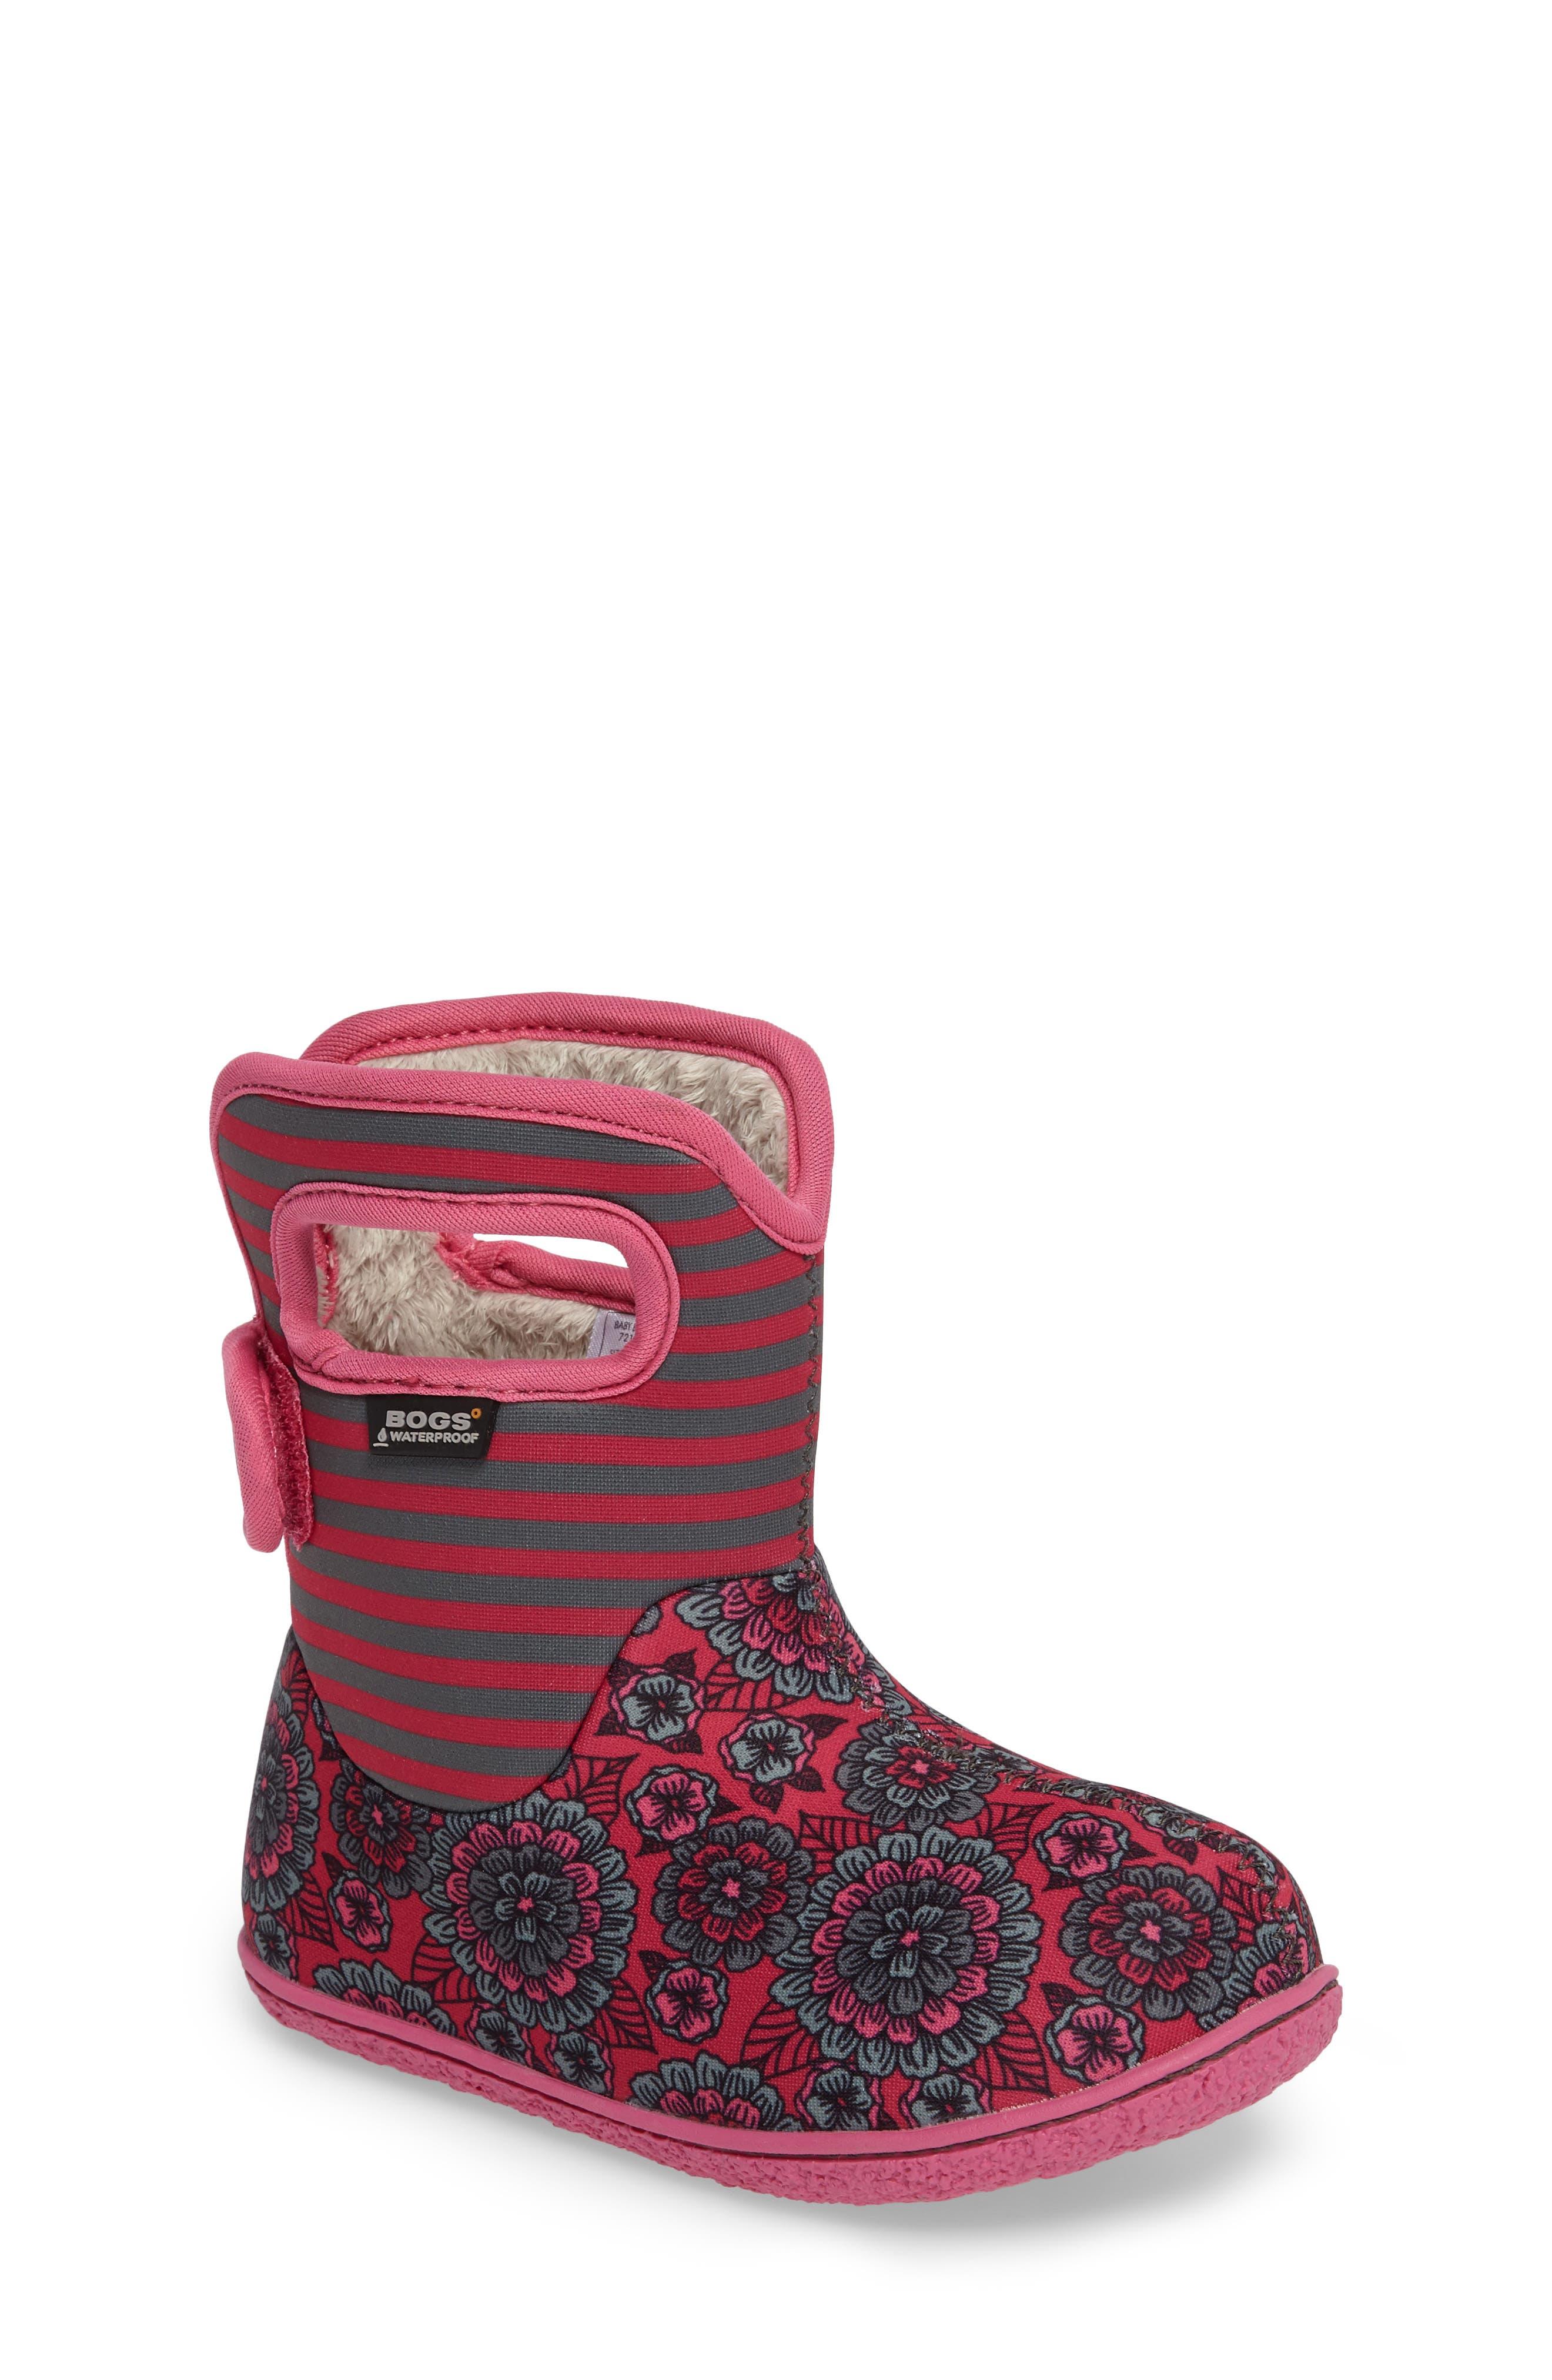 BOGS Baby Bogs Pansy Stripe Waterproof Boot